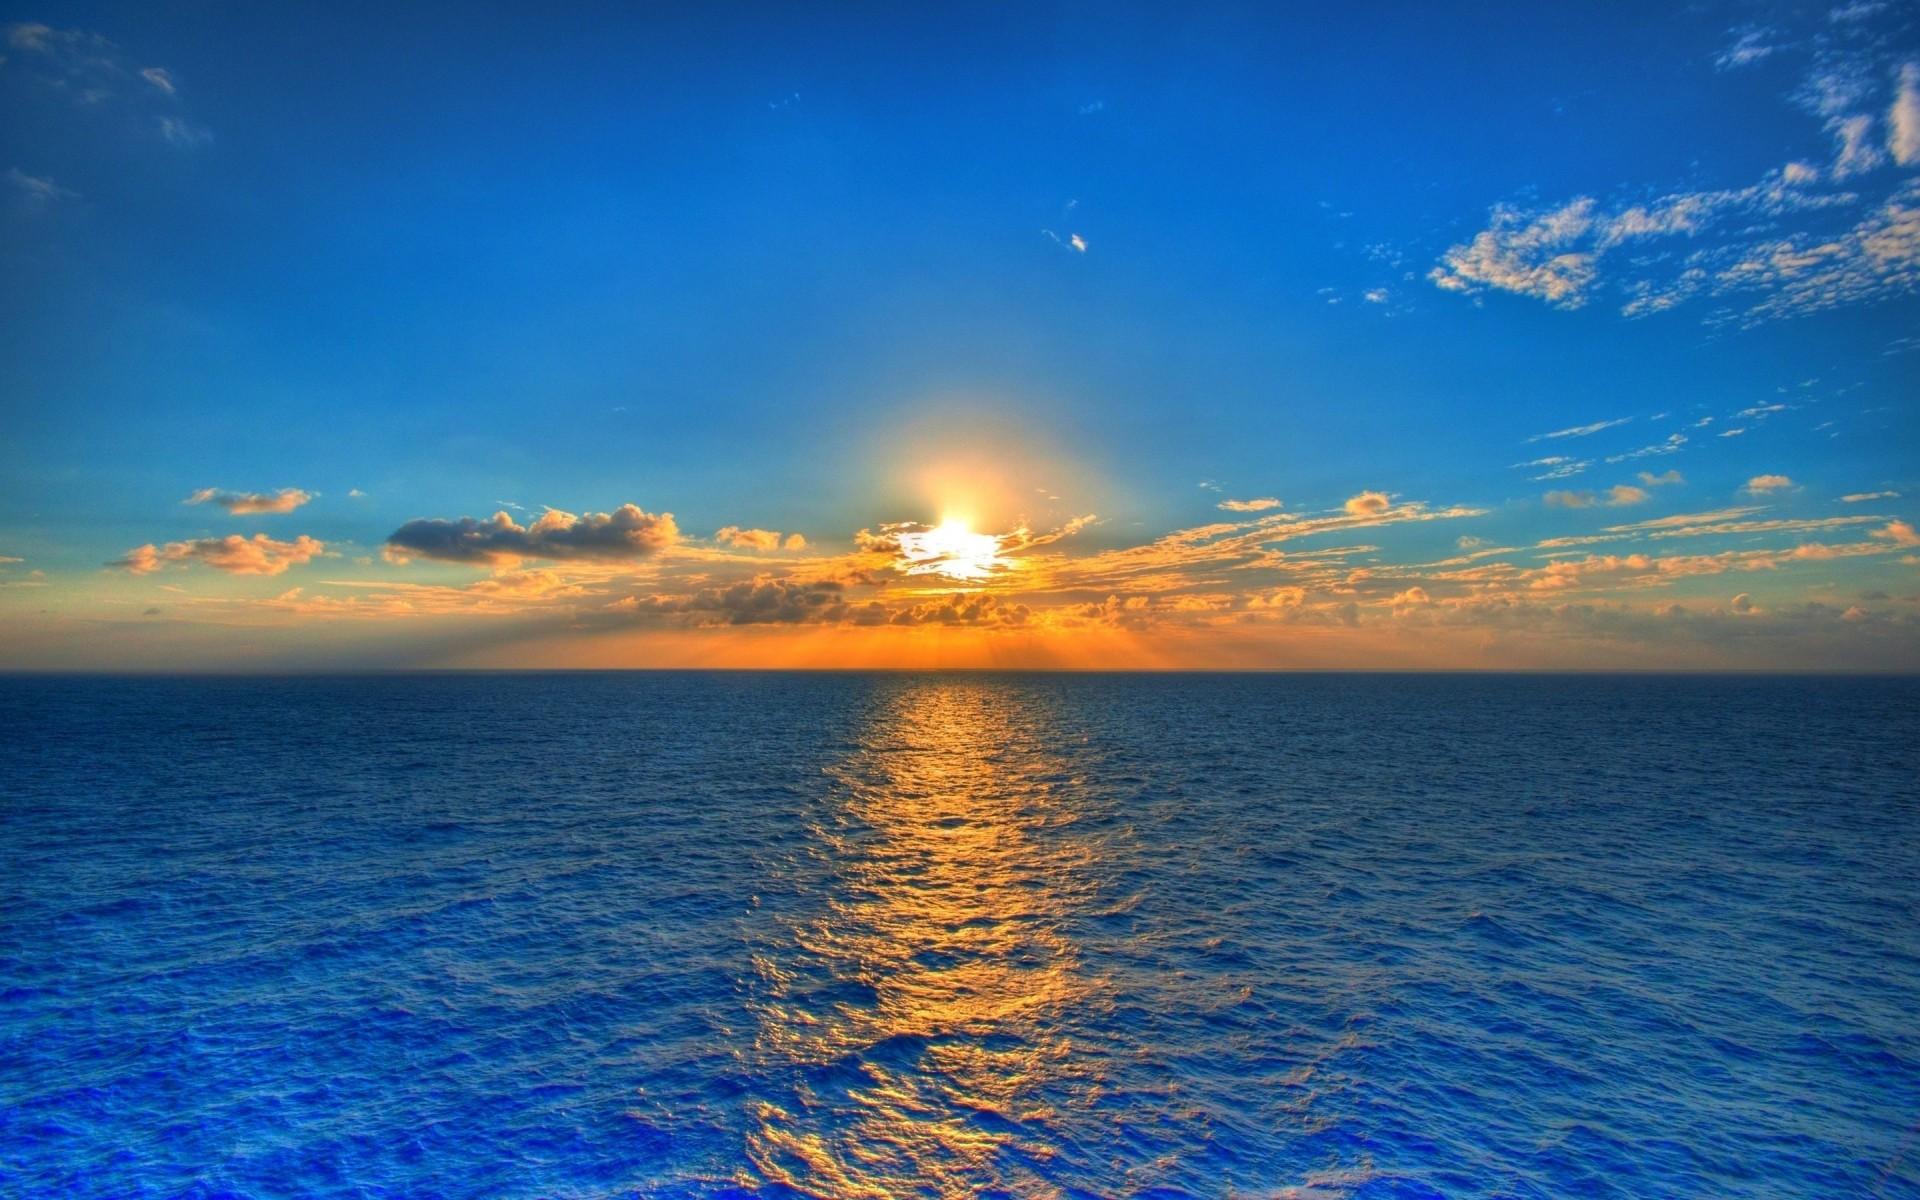 sun and paradise blue sky #istanbul #turkey #trip #travel #colors #blue #sky #clouds #hotel #radissonblu #architecture #beauty #modern #building #autumn #october #vsco #vscocam #vscotravel bula #neverleaving @radissonbluresortfiji #holidays #fiji #paradise #raddisonblu @brisbanecitygal.